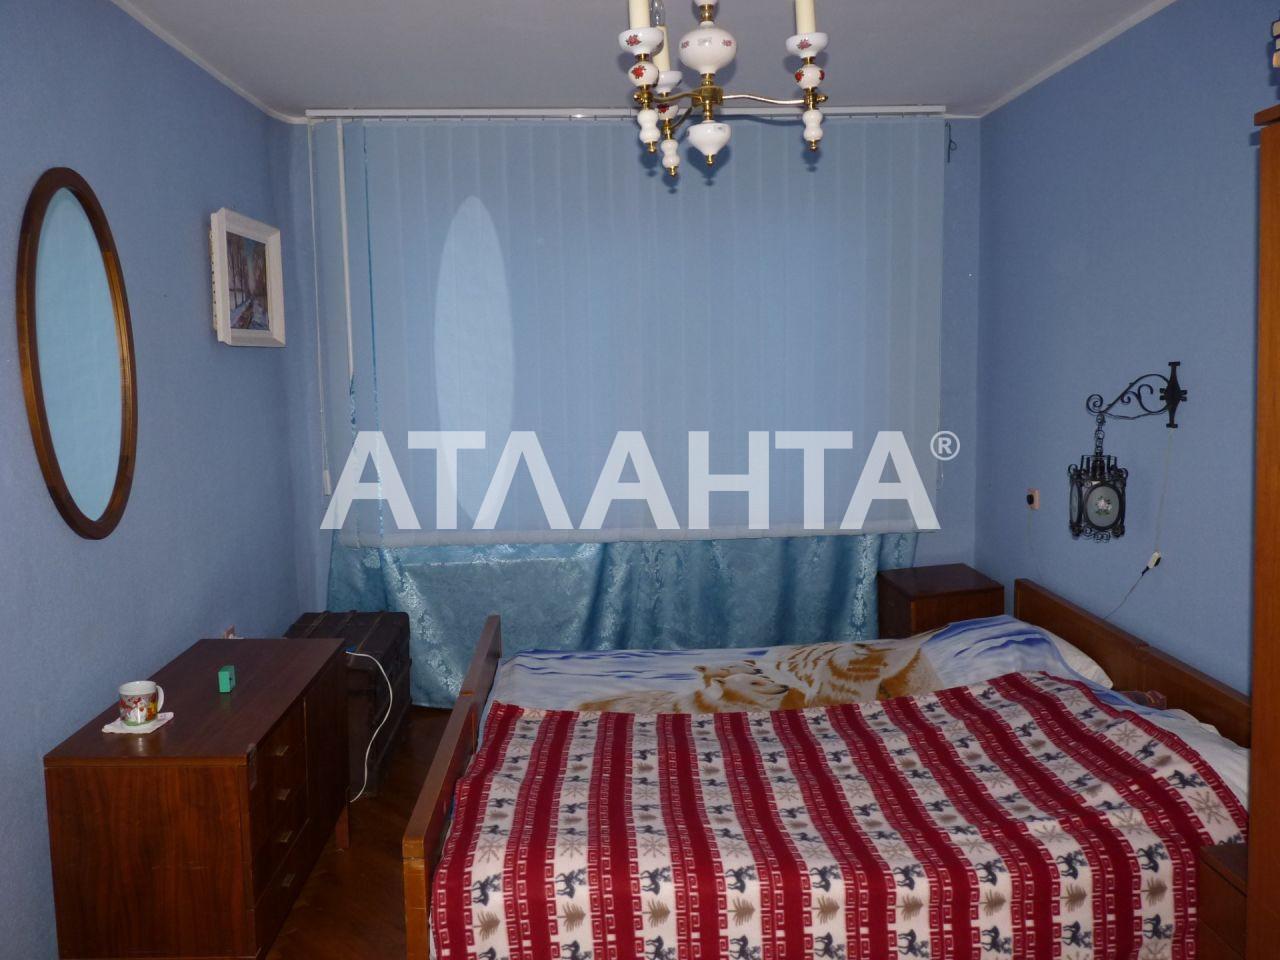 Продается 4-комнатная Квартира на ул. Днепровская Наб. — 65 000 у.е. (фото №6)